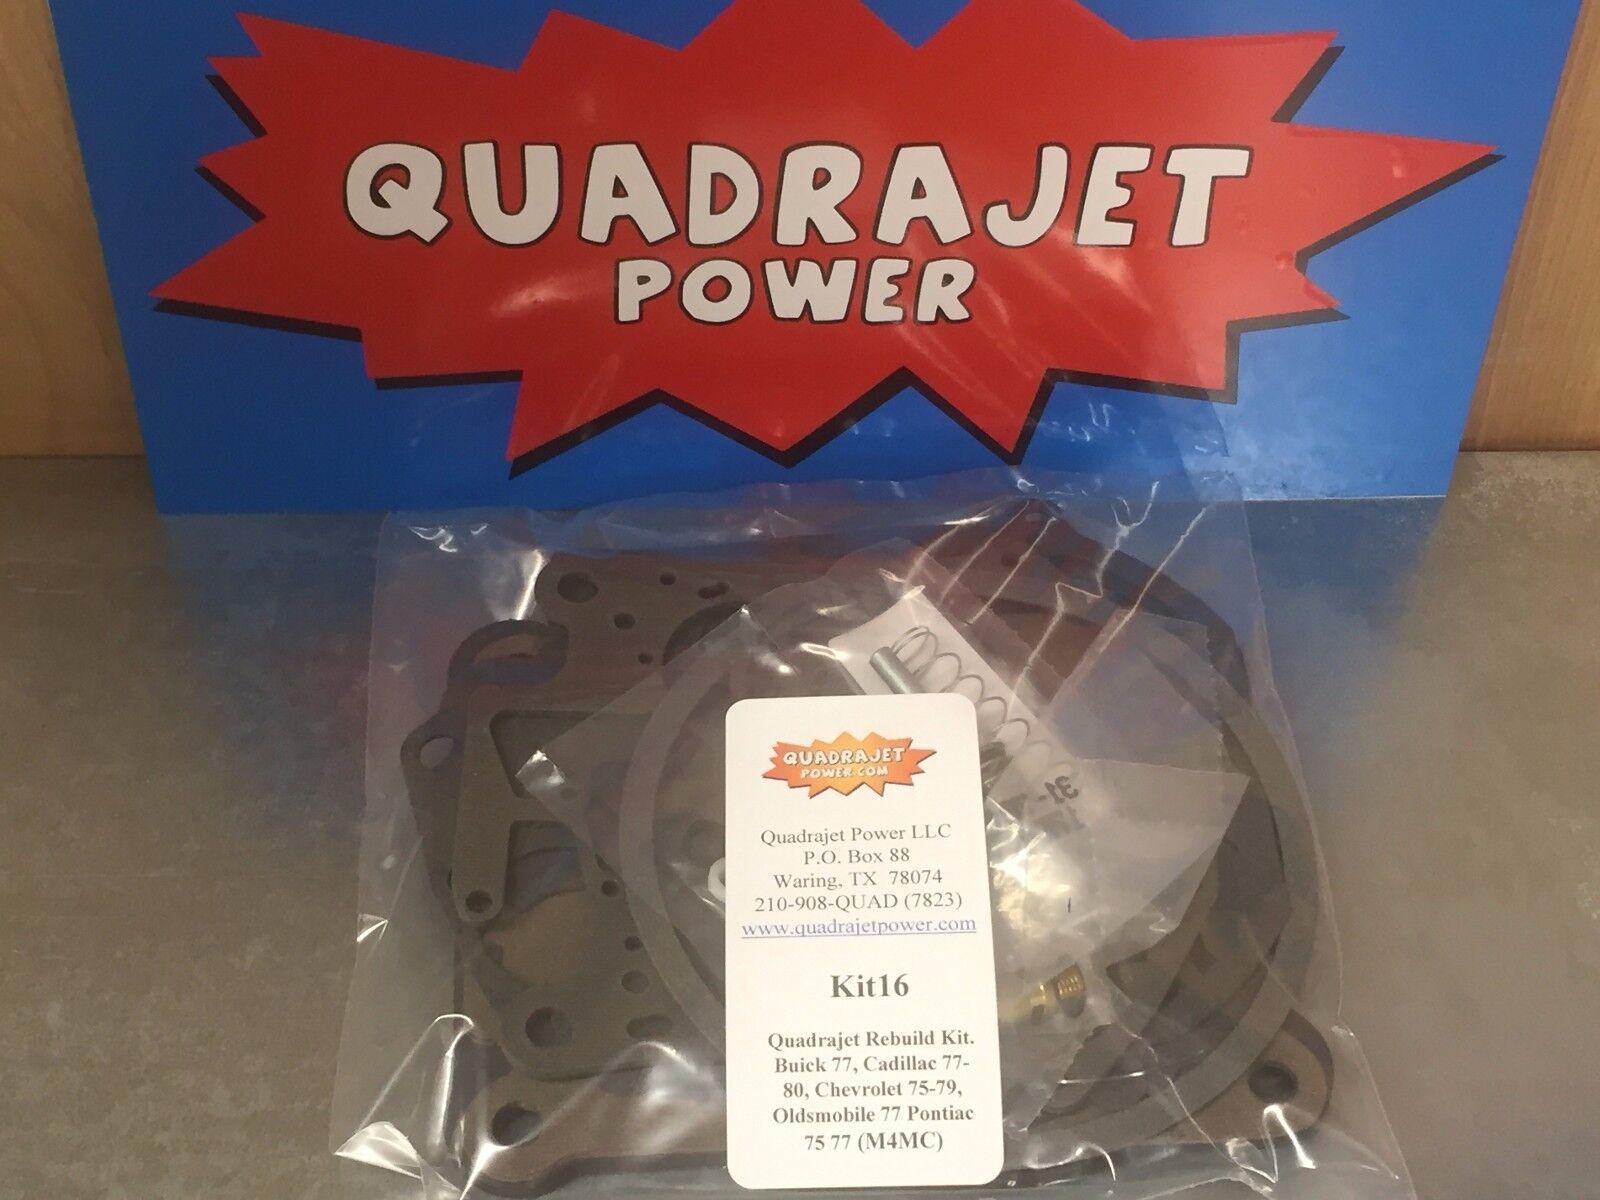 Quadrajet Rebuild Kit  Buick 77 Cad 77-80 Chevy 75-79